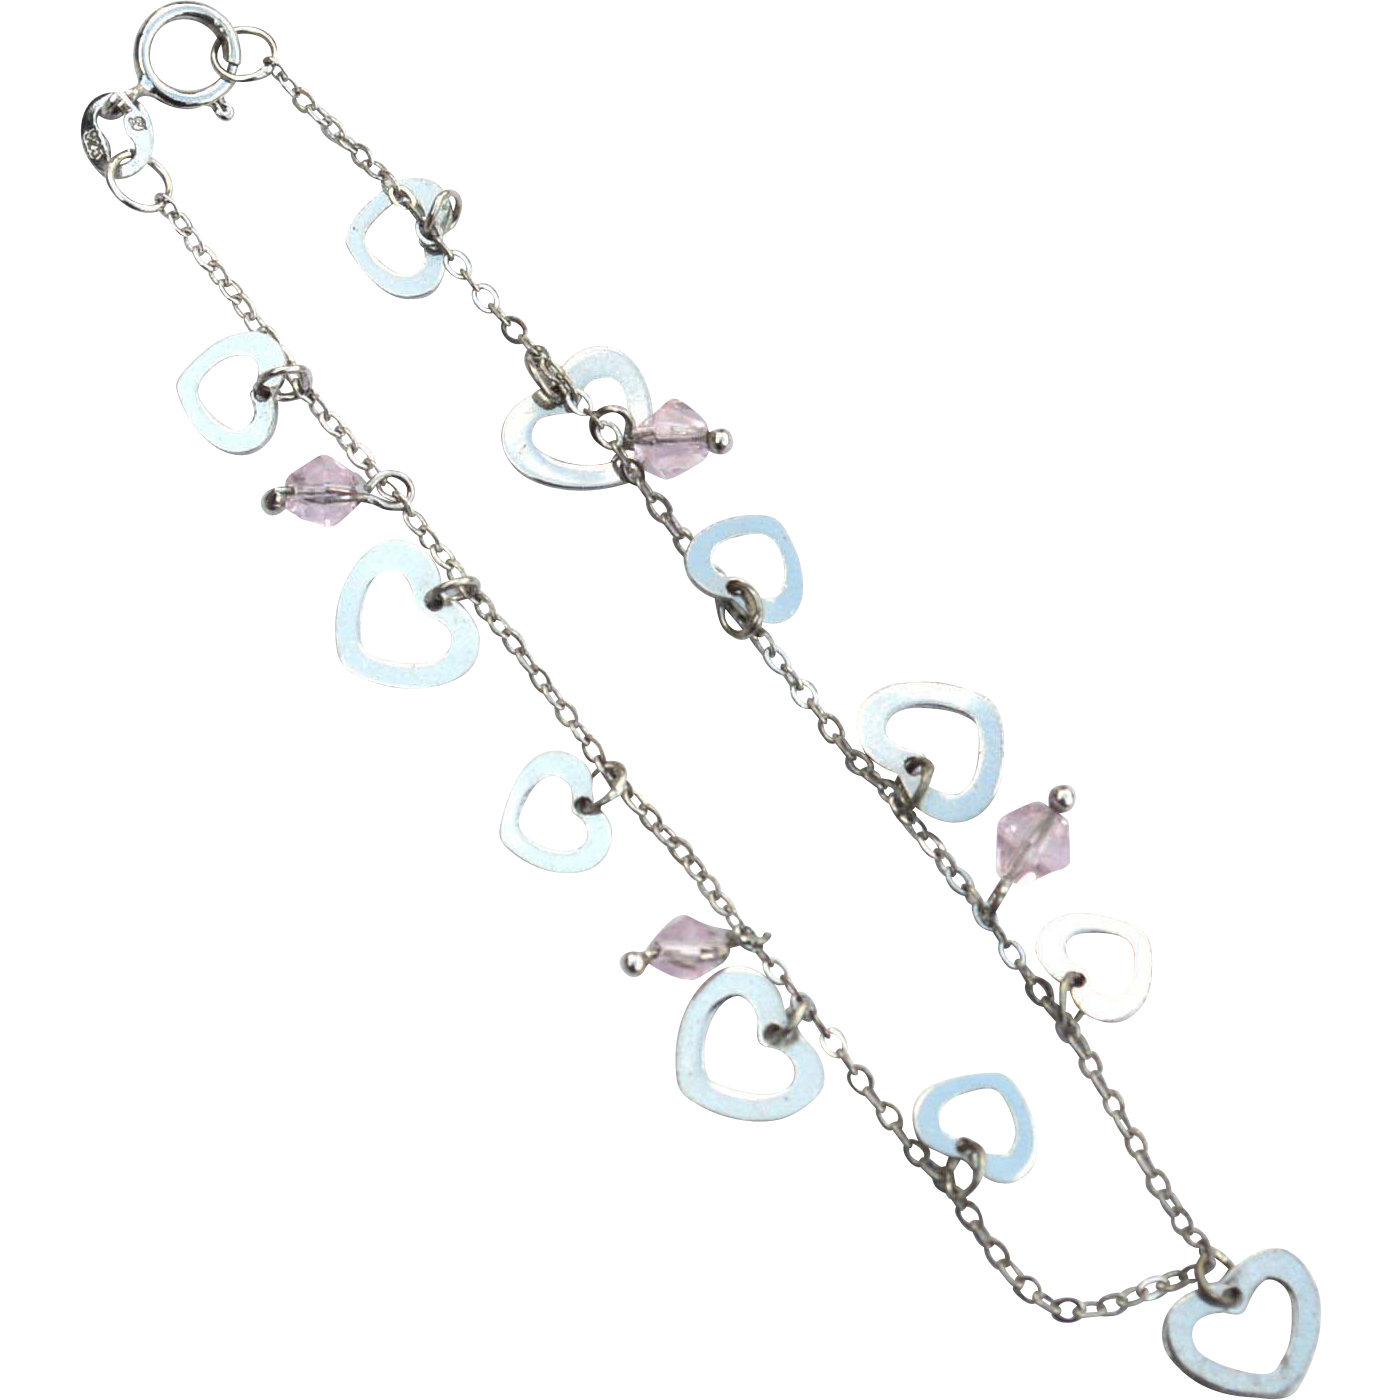 Vintage Hallmarked STERLING SILVER Dangling Heart and Pink Crystal Charm Bracelet